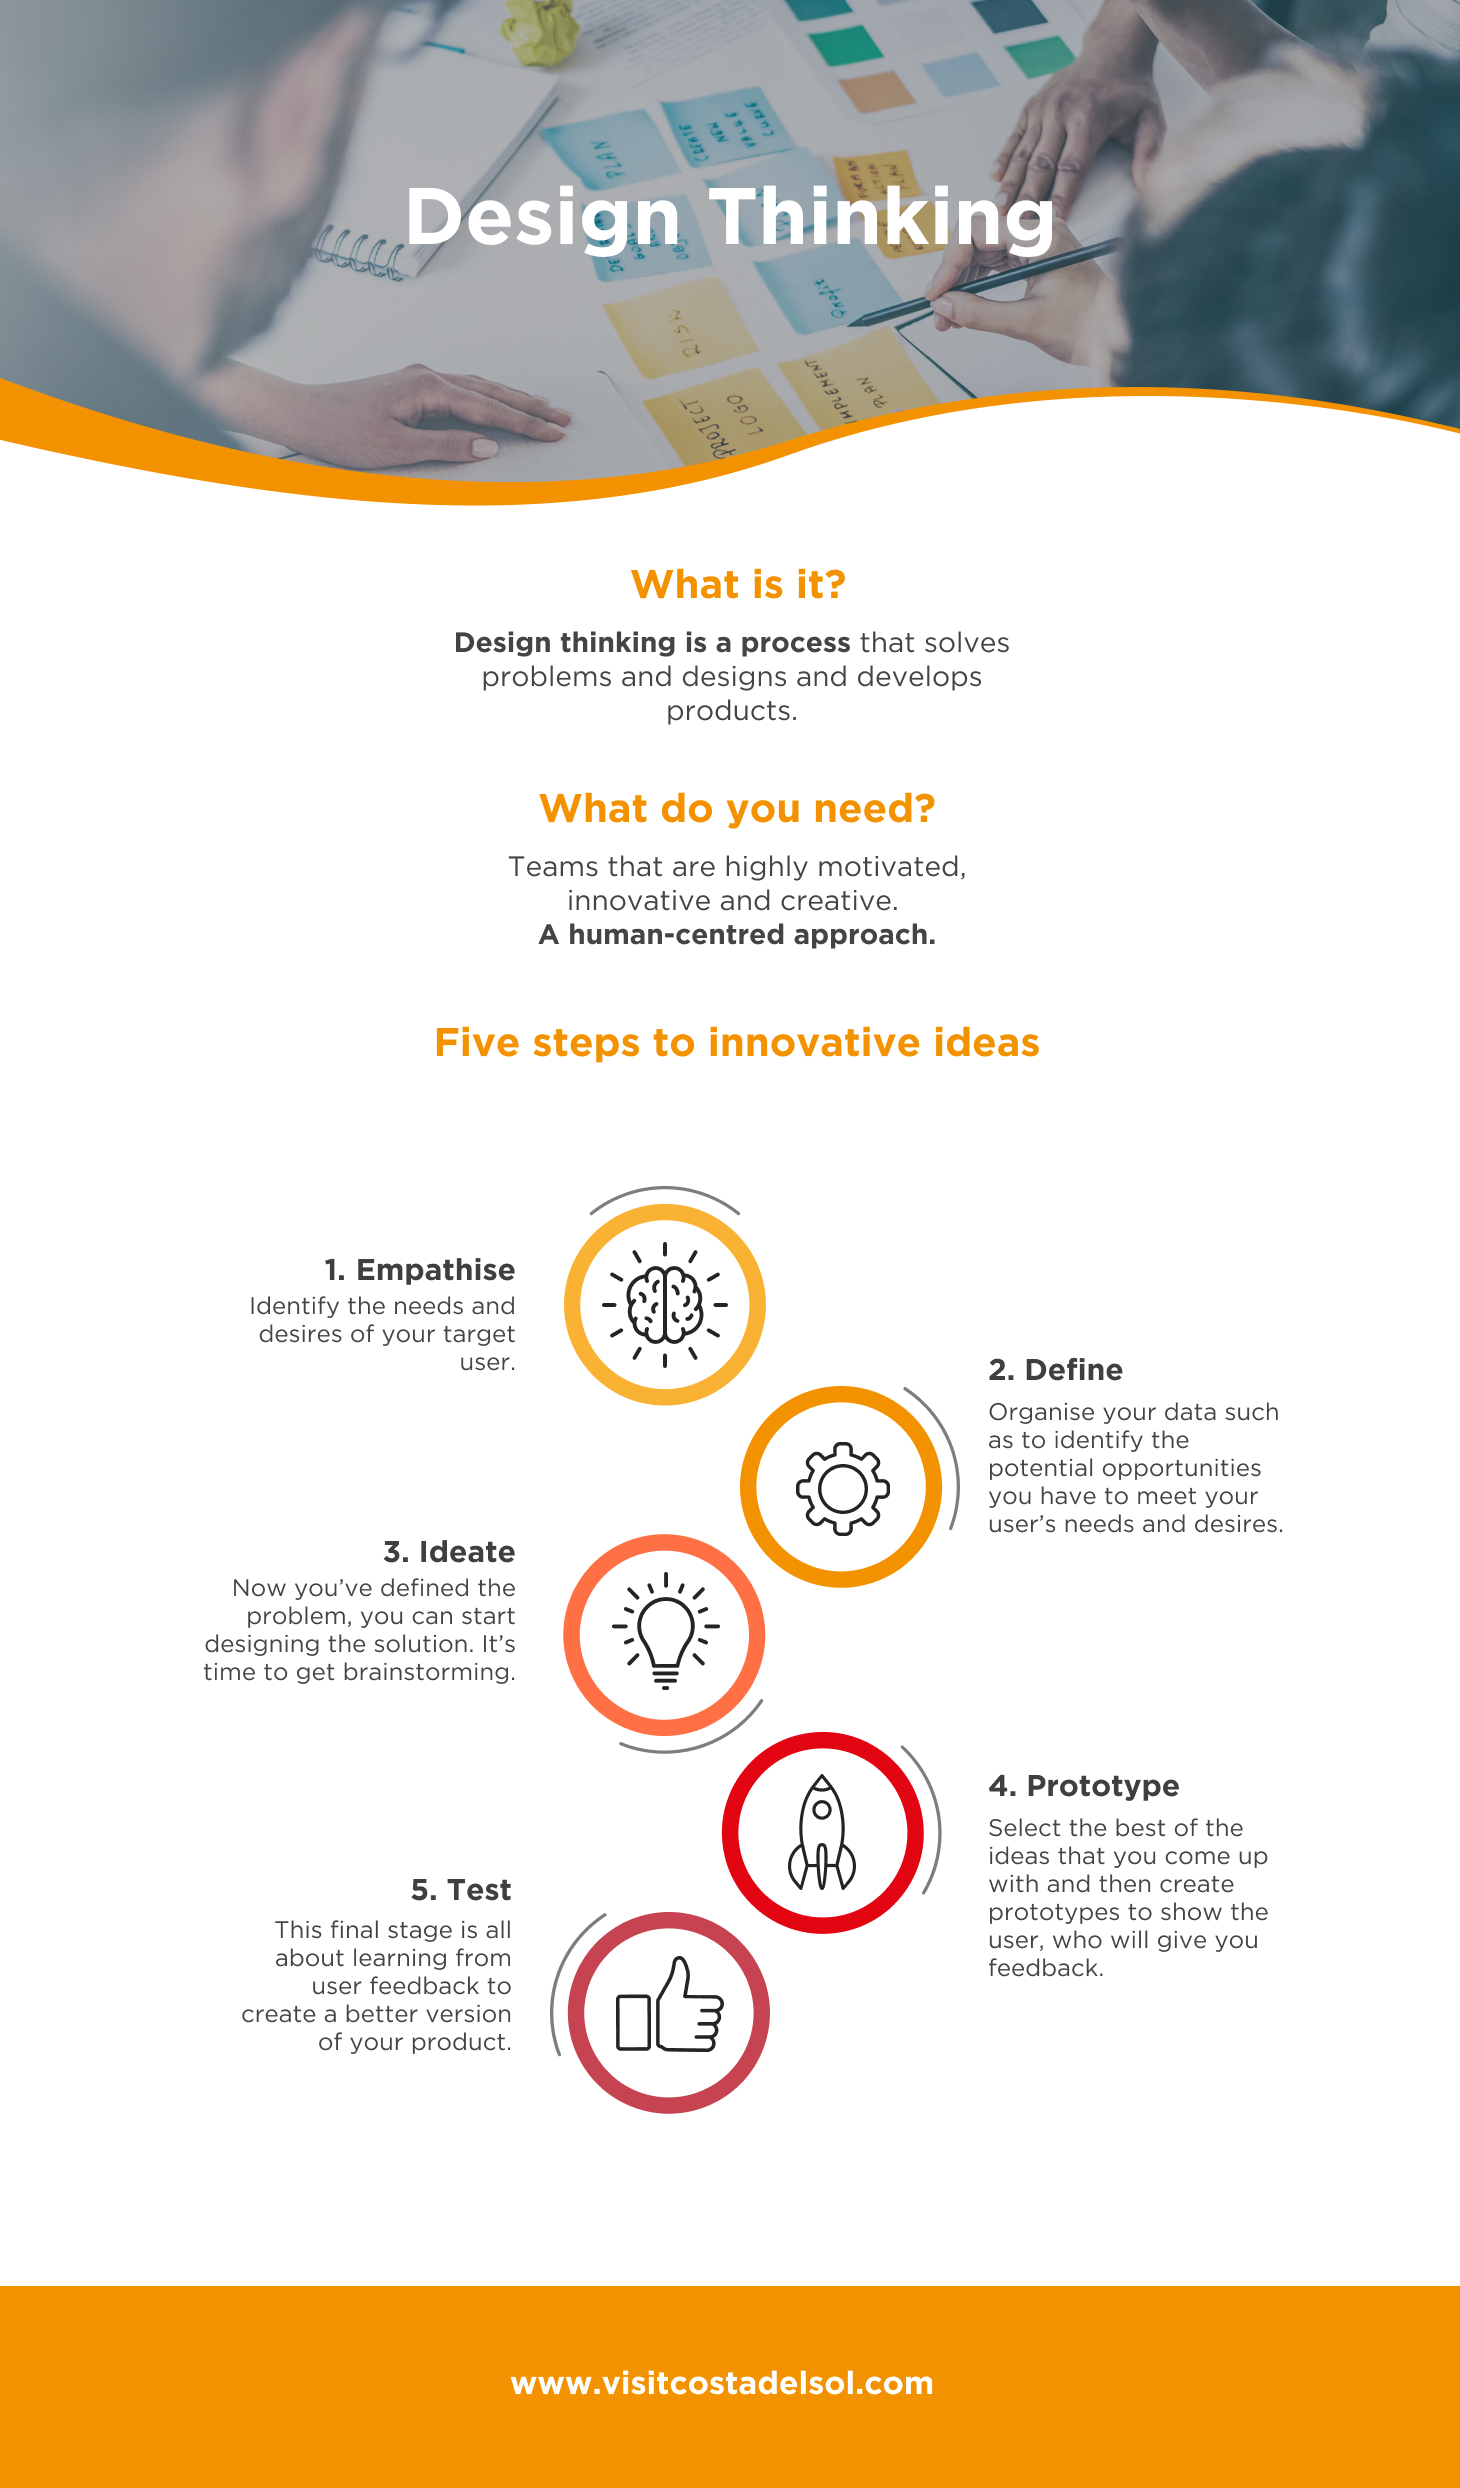 csol_infografia_2_design thinking_EN